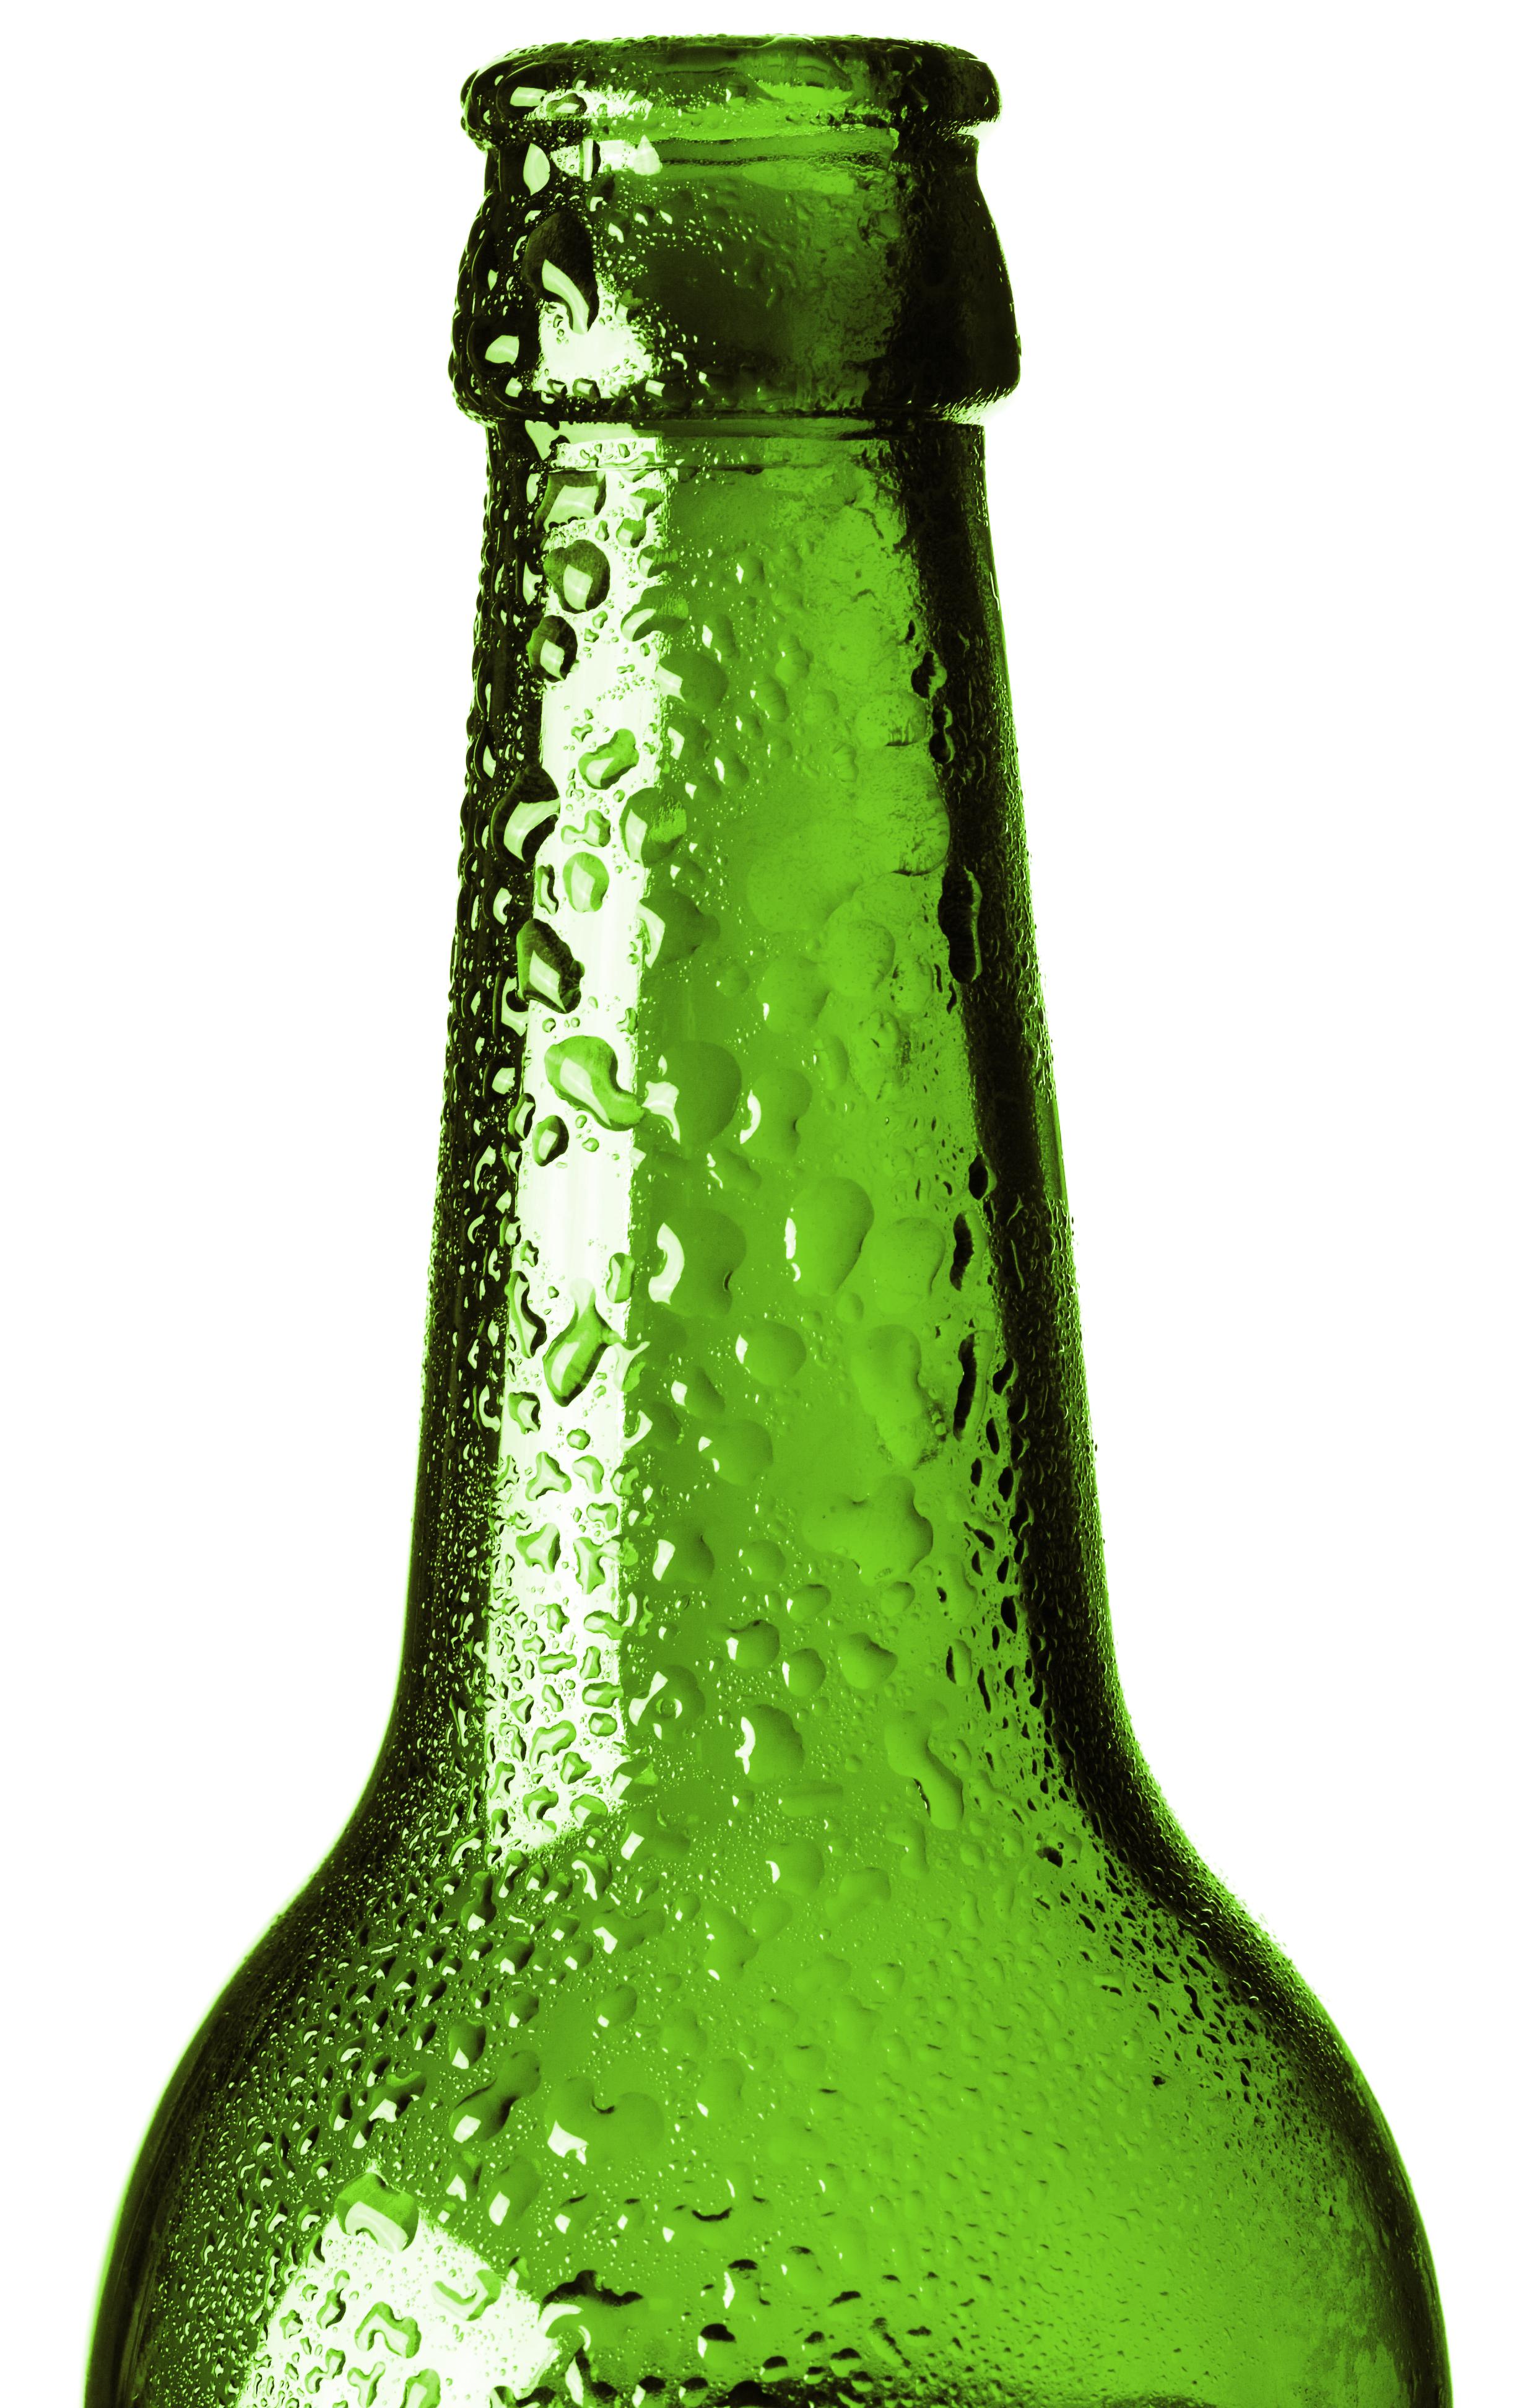 Glass bottle photo